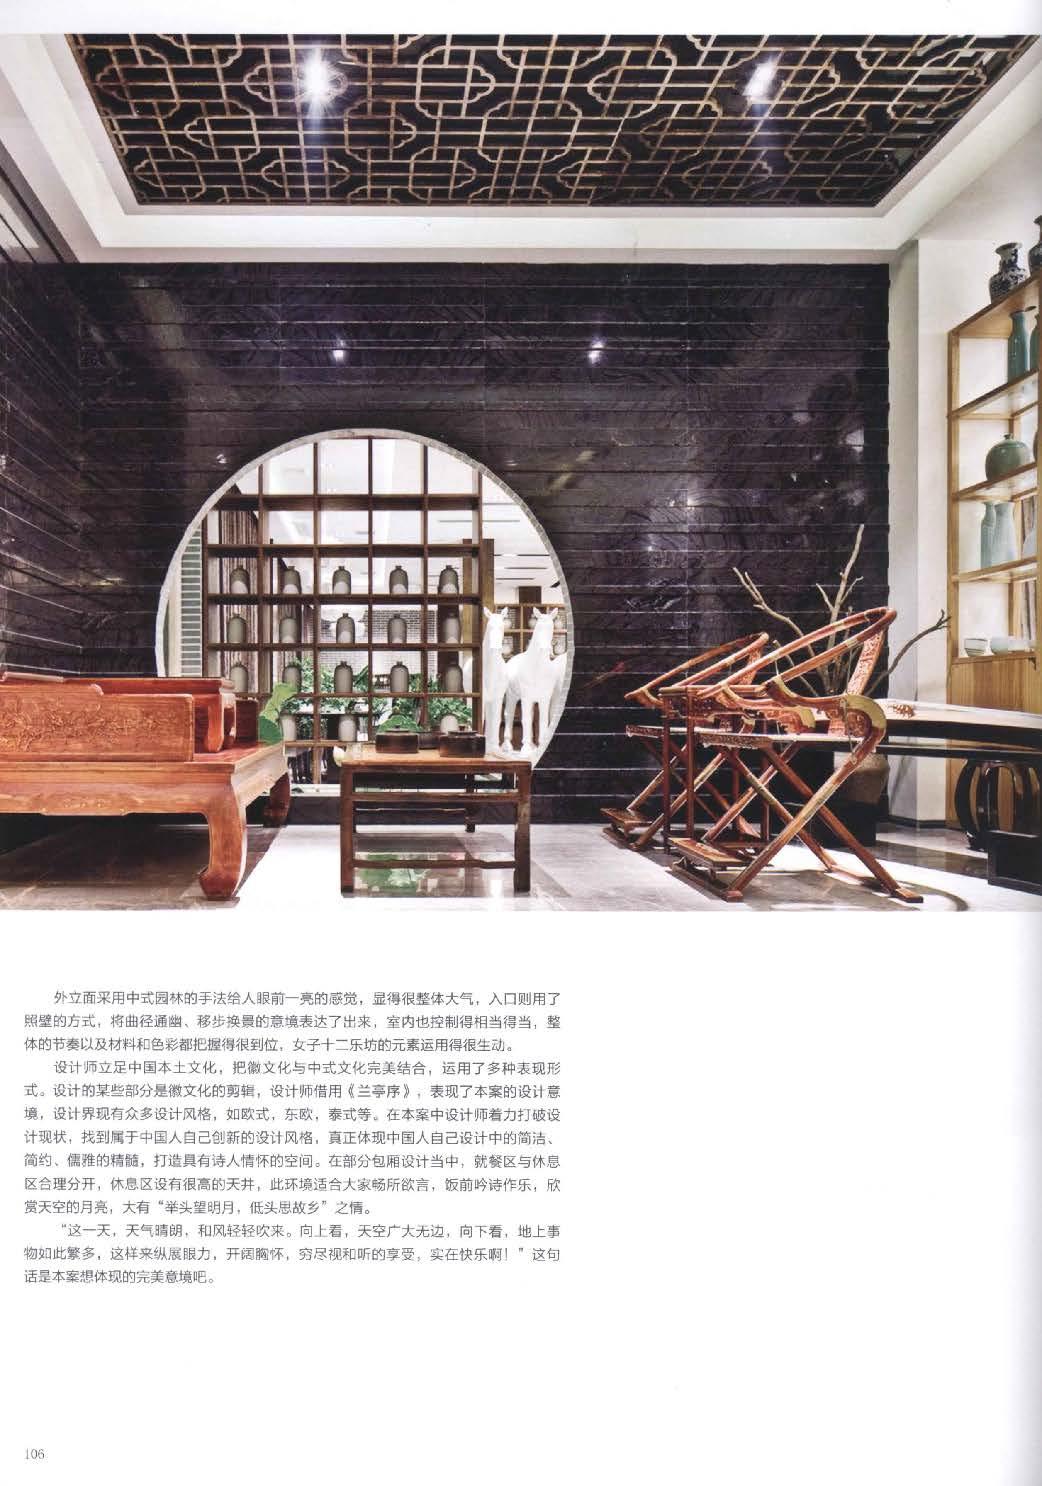 H073 东方风情 会所、餐饮细部解析_Page_104.jpg